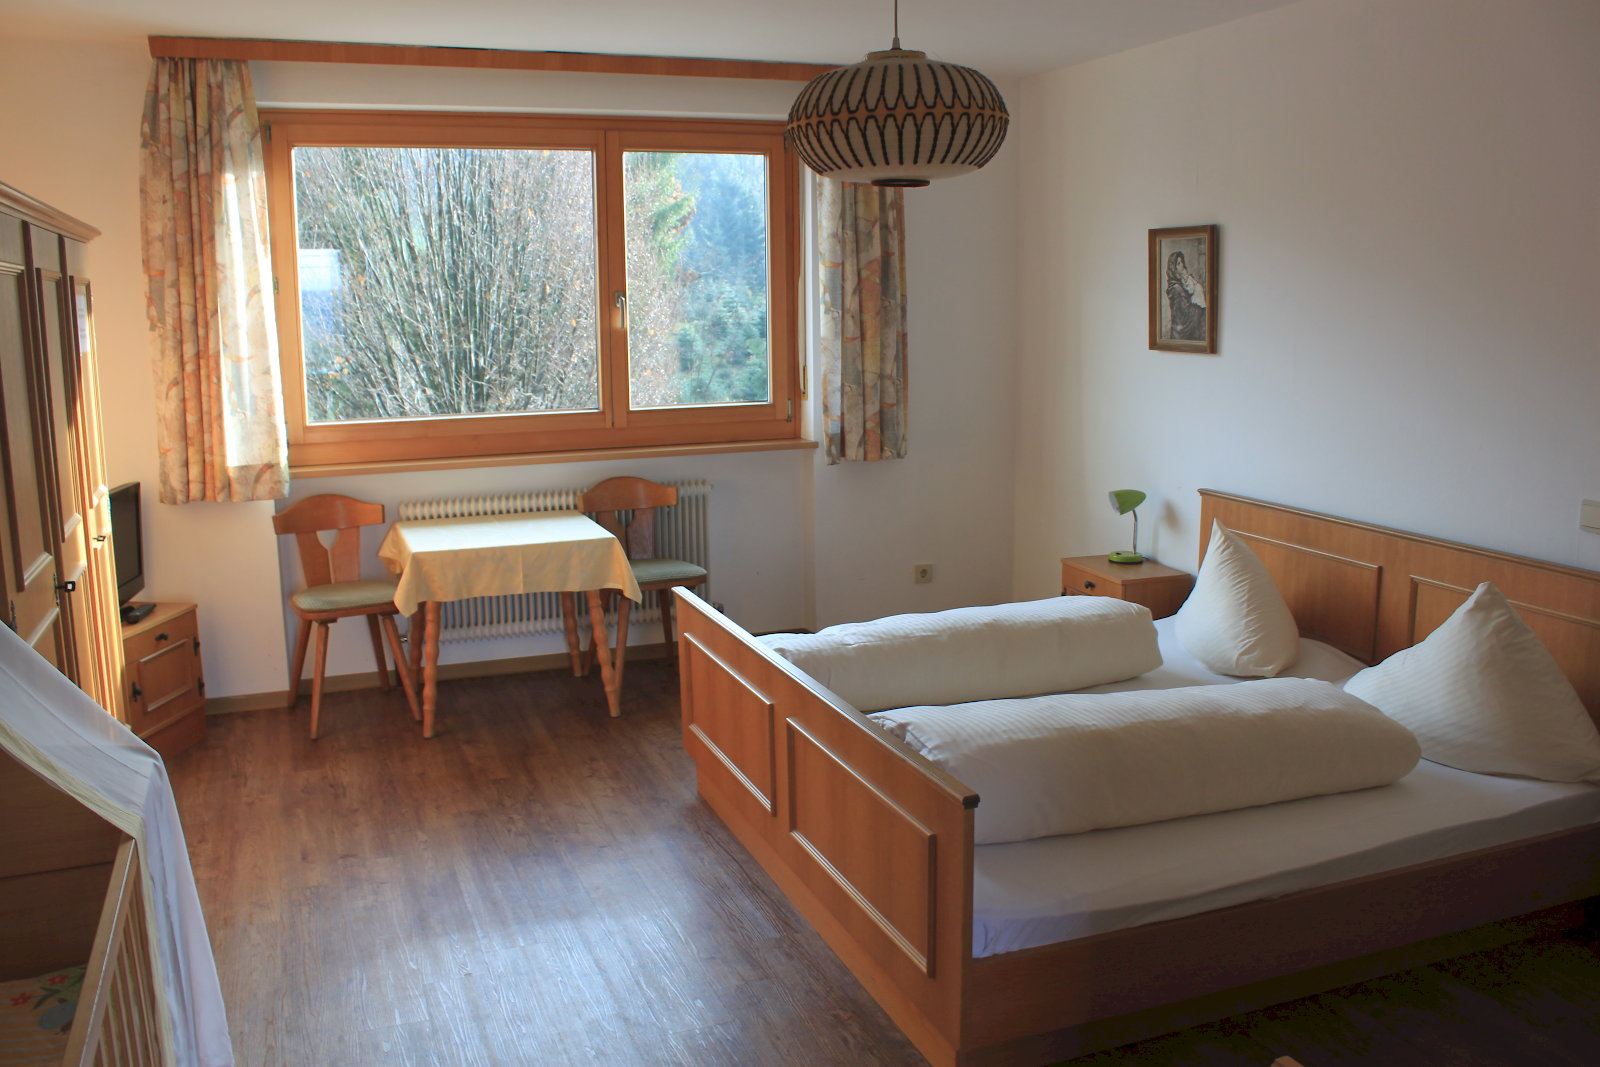 Appartement de vacances B&B - Restaurant TSINGDAO (Hörbranz). Doppelzimmer (2437460), Hörbranz, Bregenz, Vorarlberg, Autriche, image 1